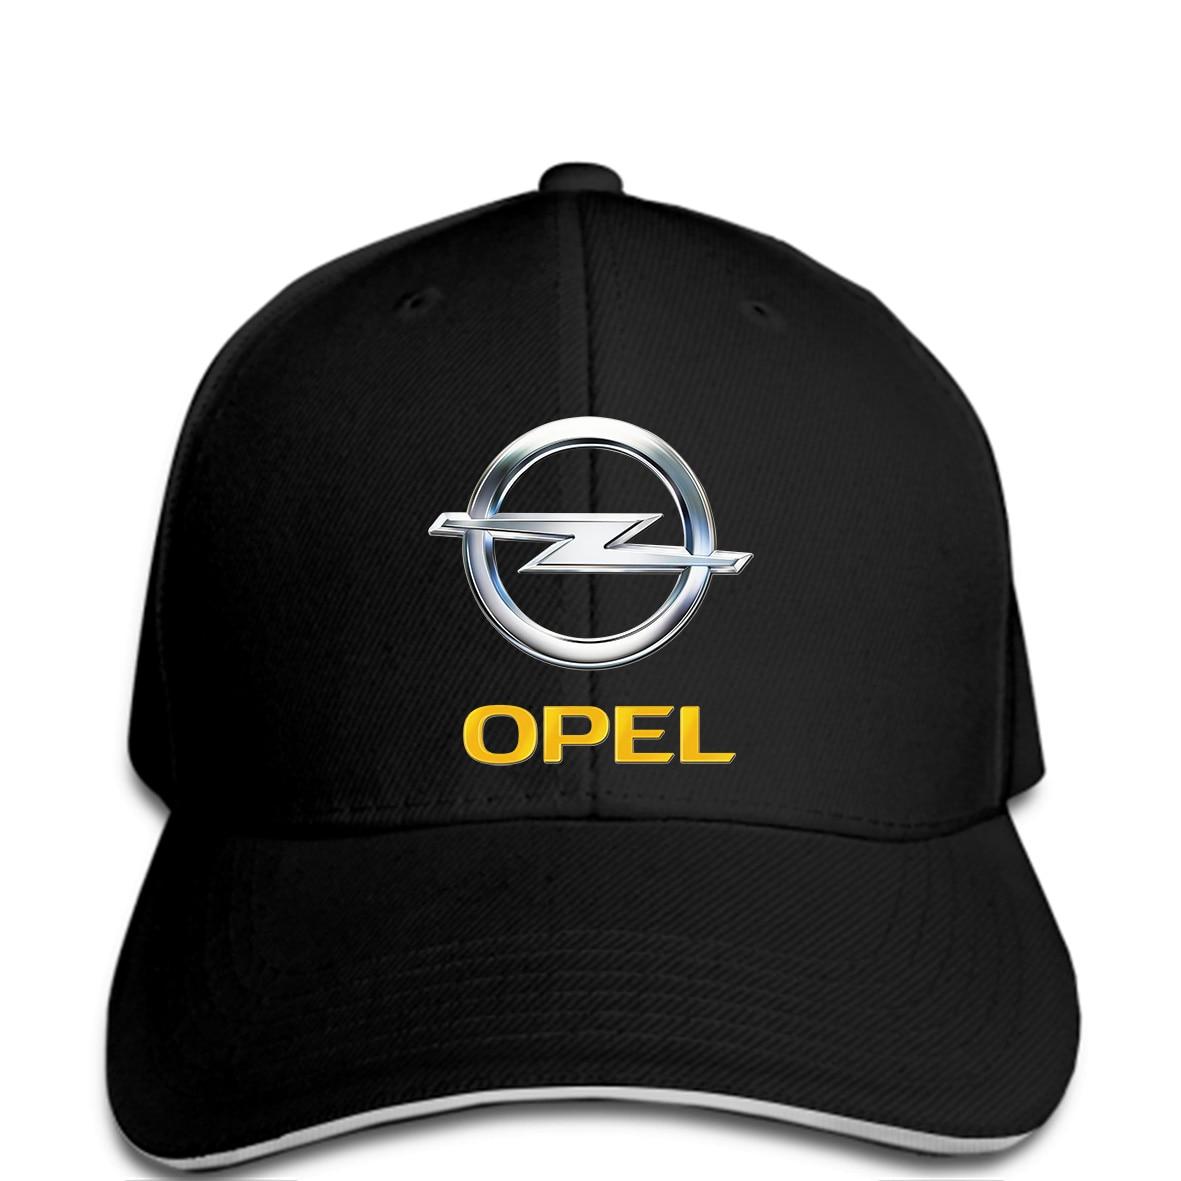 medium resolution of men baseball cap opel logo cars fashion funny hat novelty tsnapback women in baseball caps from men s clothing accessories on aliexpress com alibaba